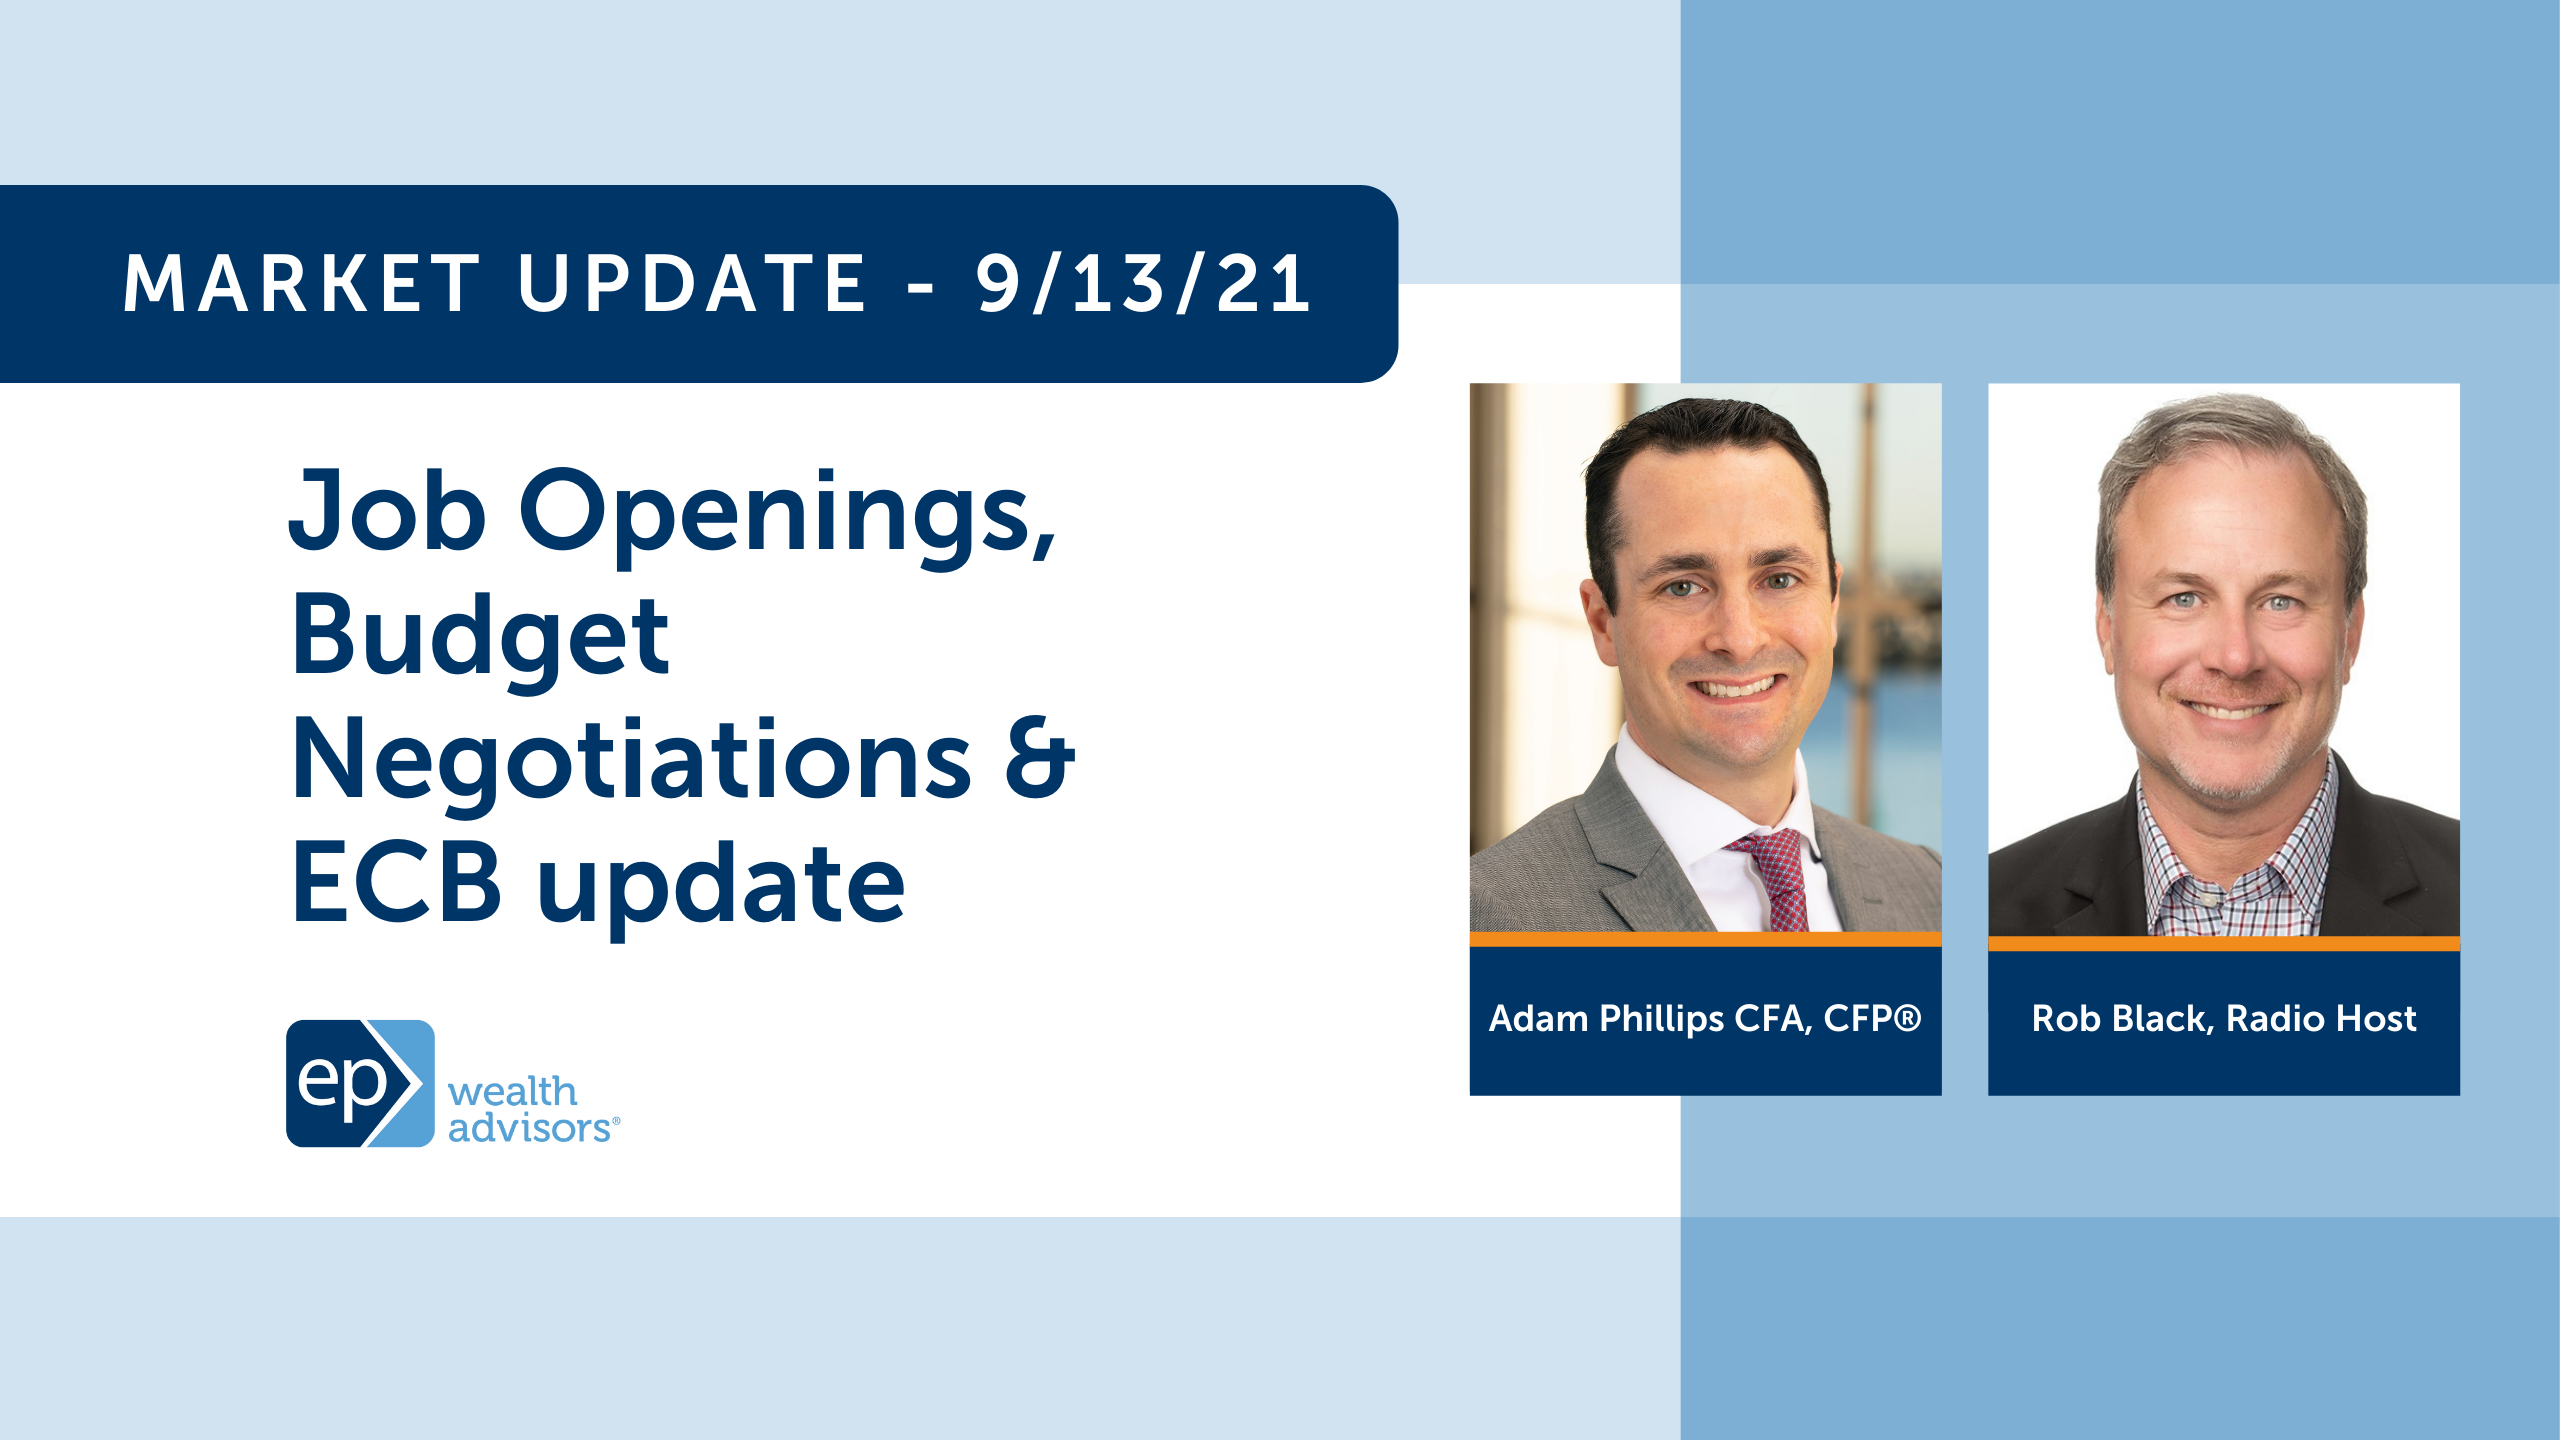 Job Openings, Budget Negotiations & ECB update